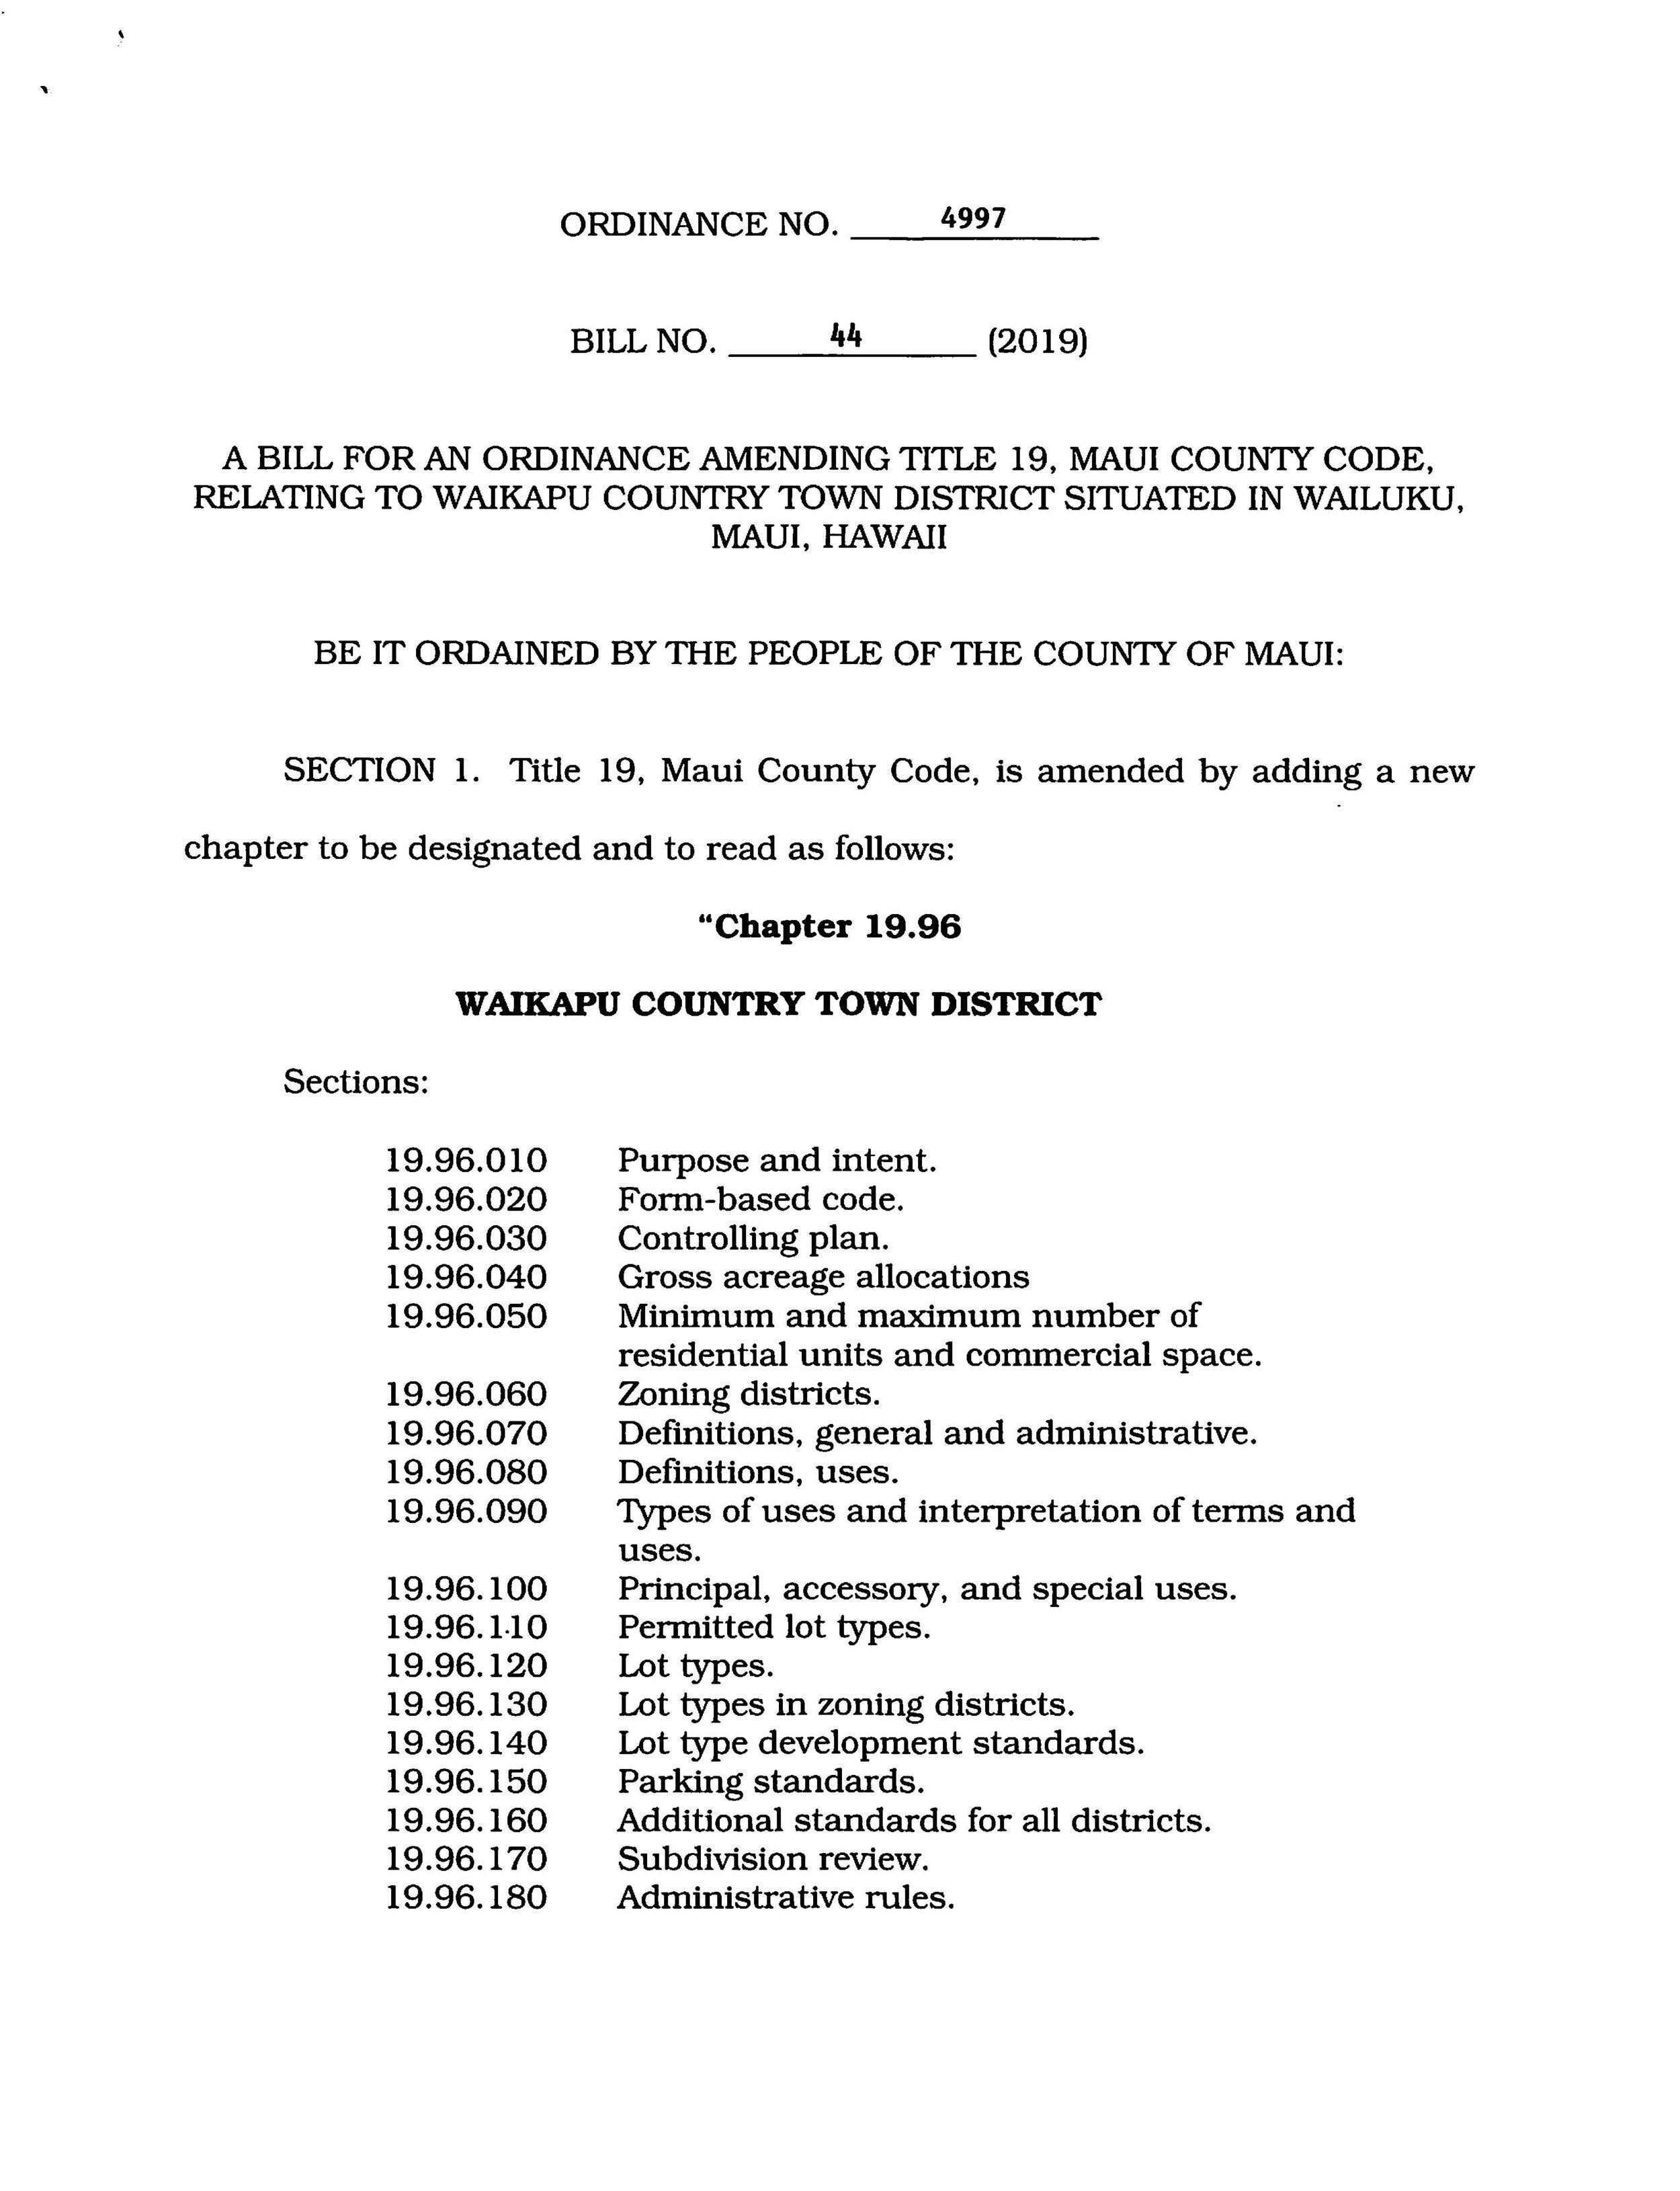 A Bill for an Ordinance Amending Title 19 - October 2019